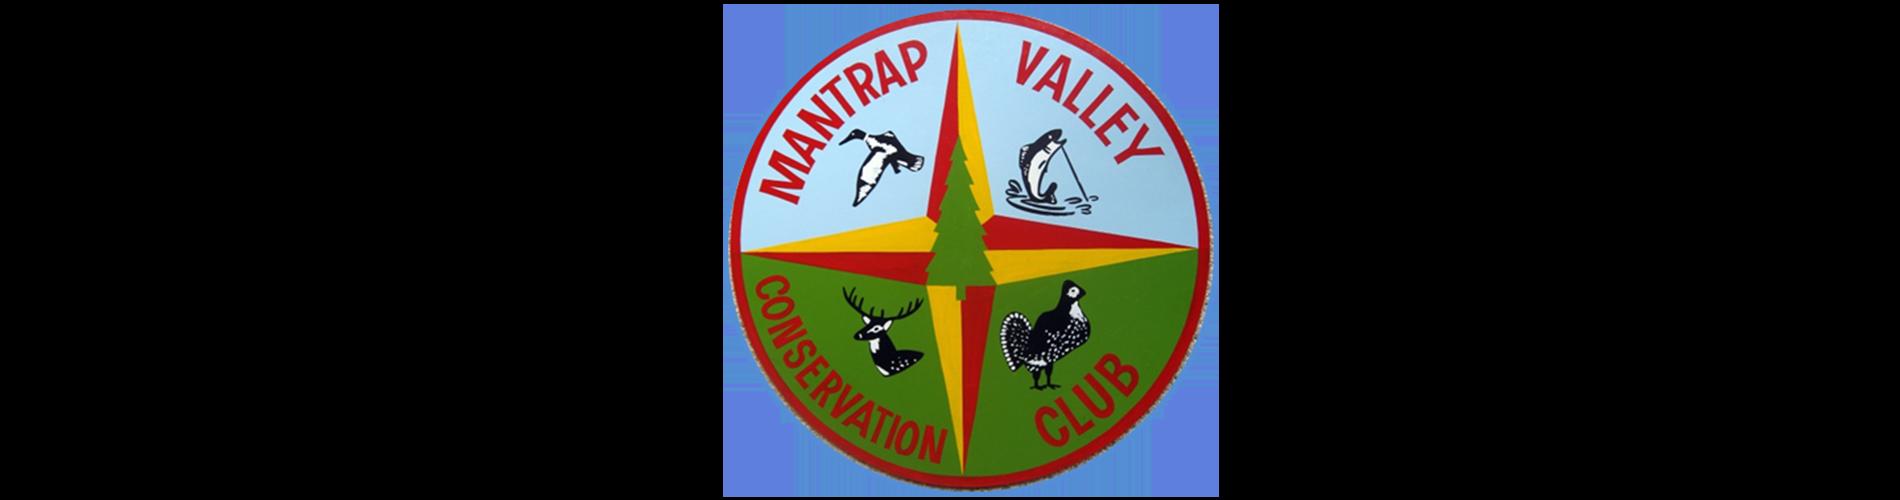 MVCC Membership